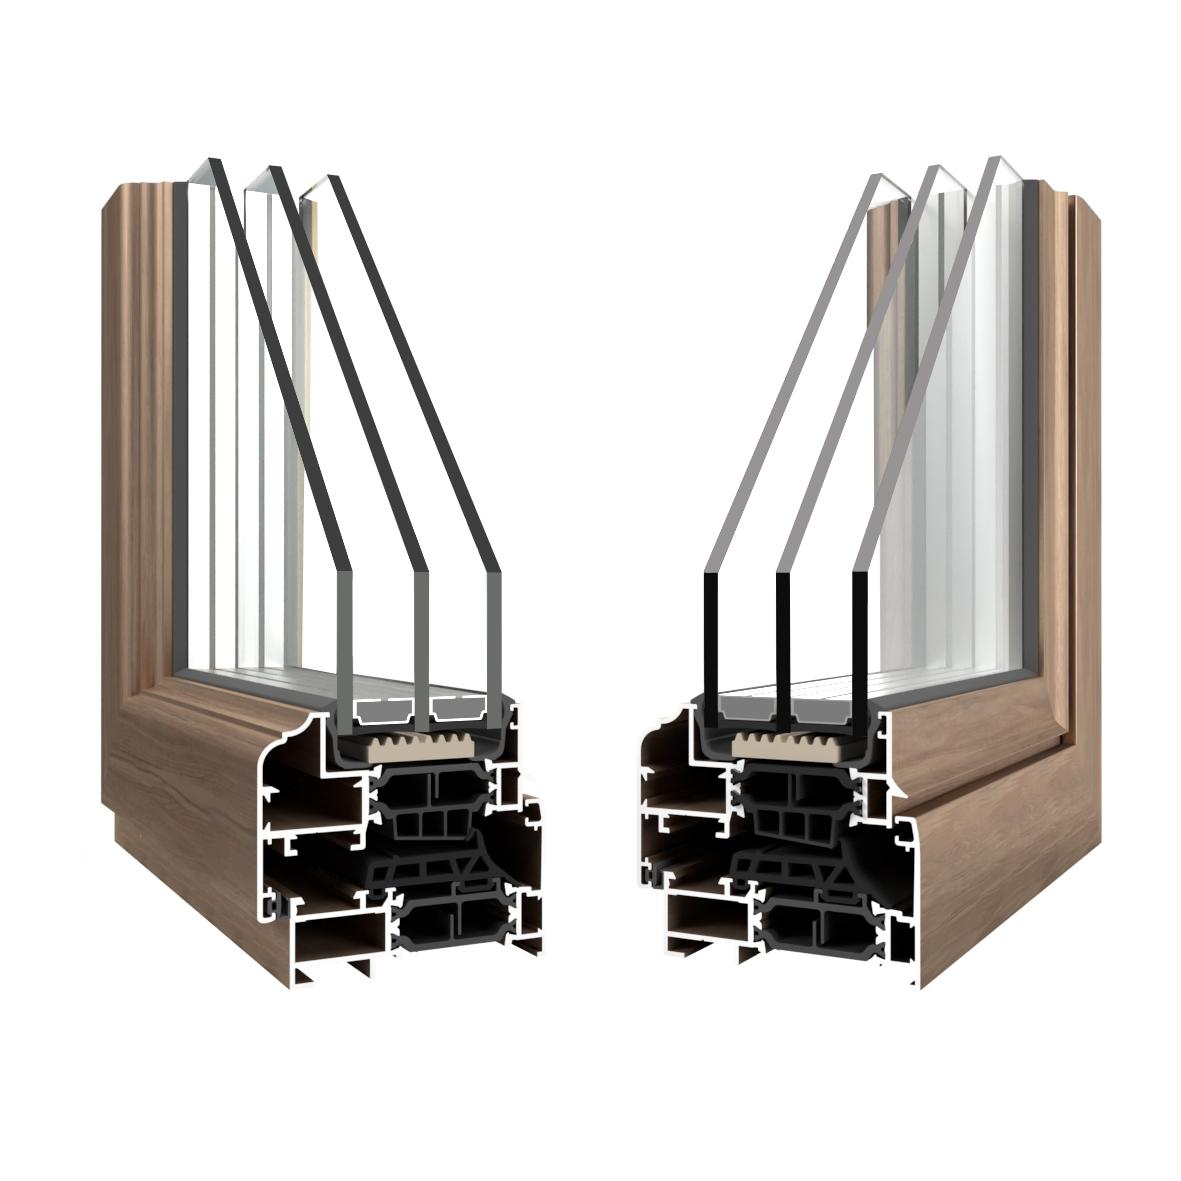 https://www.allpaint.it/wp-content/uploads/2021/07/smartline-classic-alluminio-allpaint.jpg